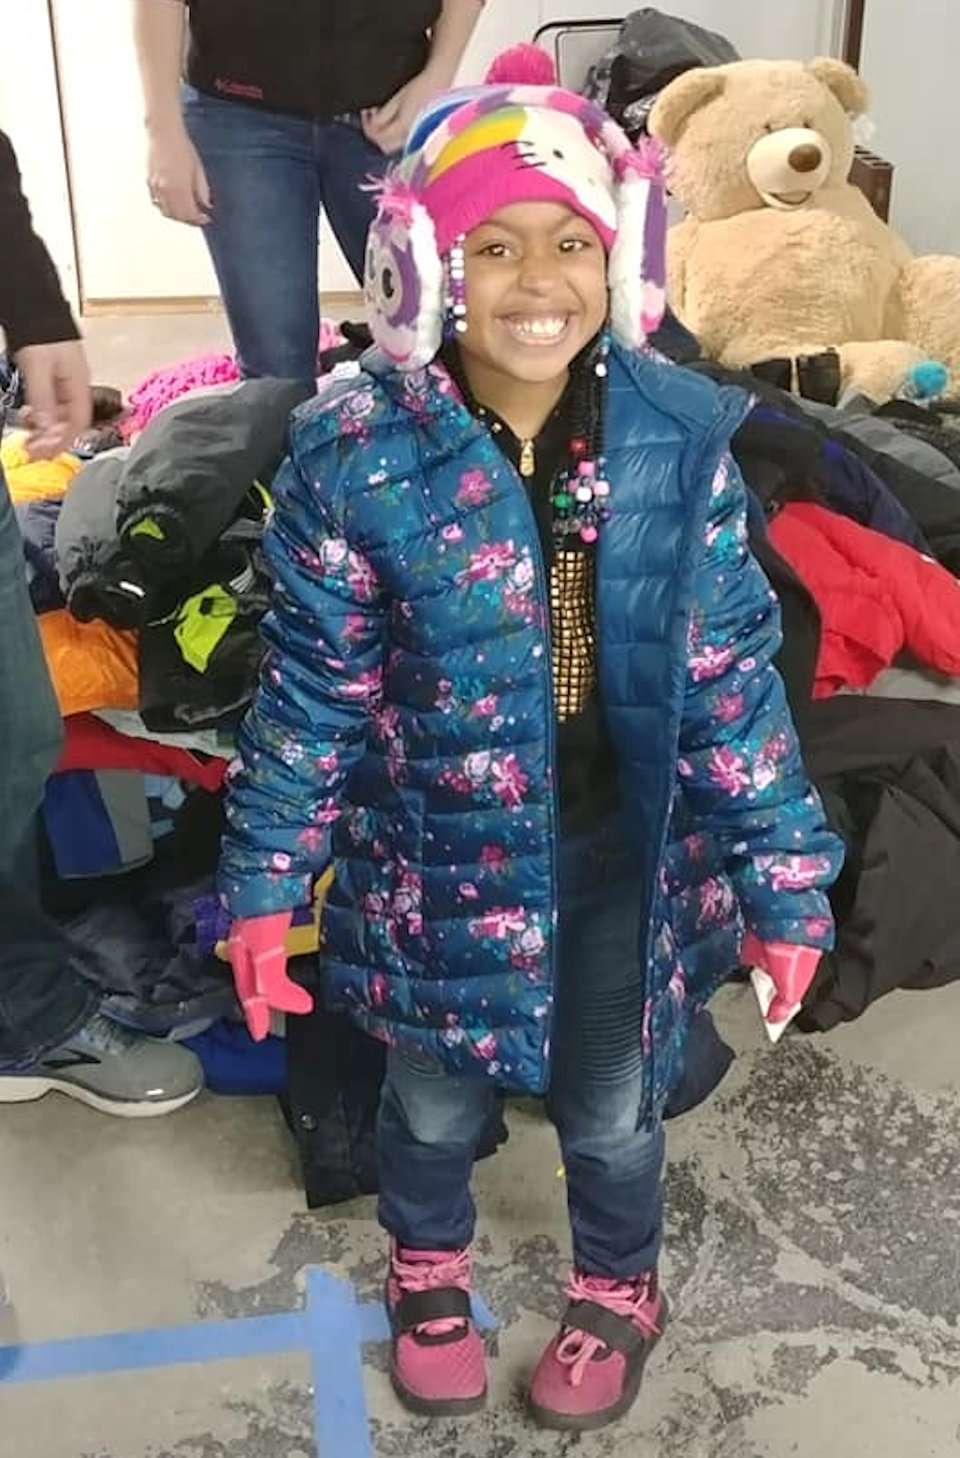 Girl with winter coat